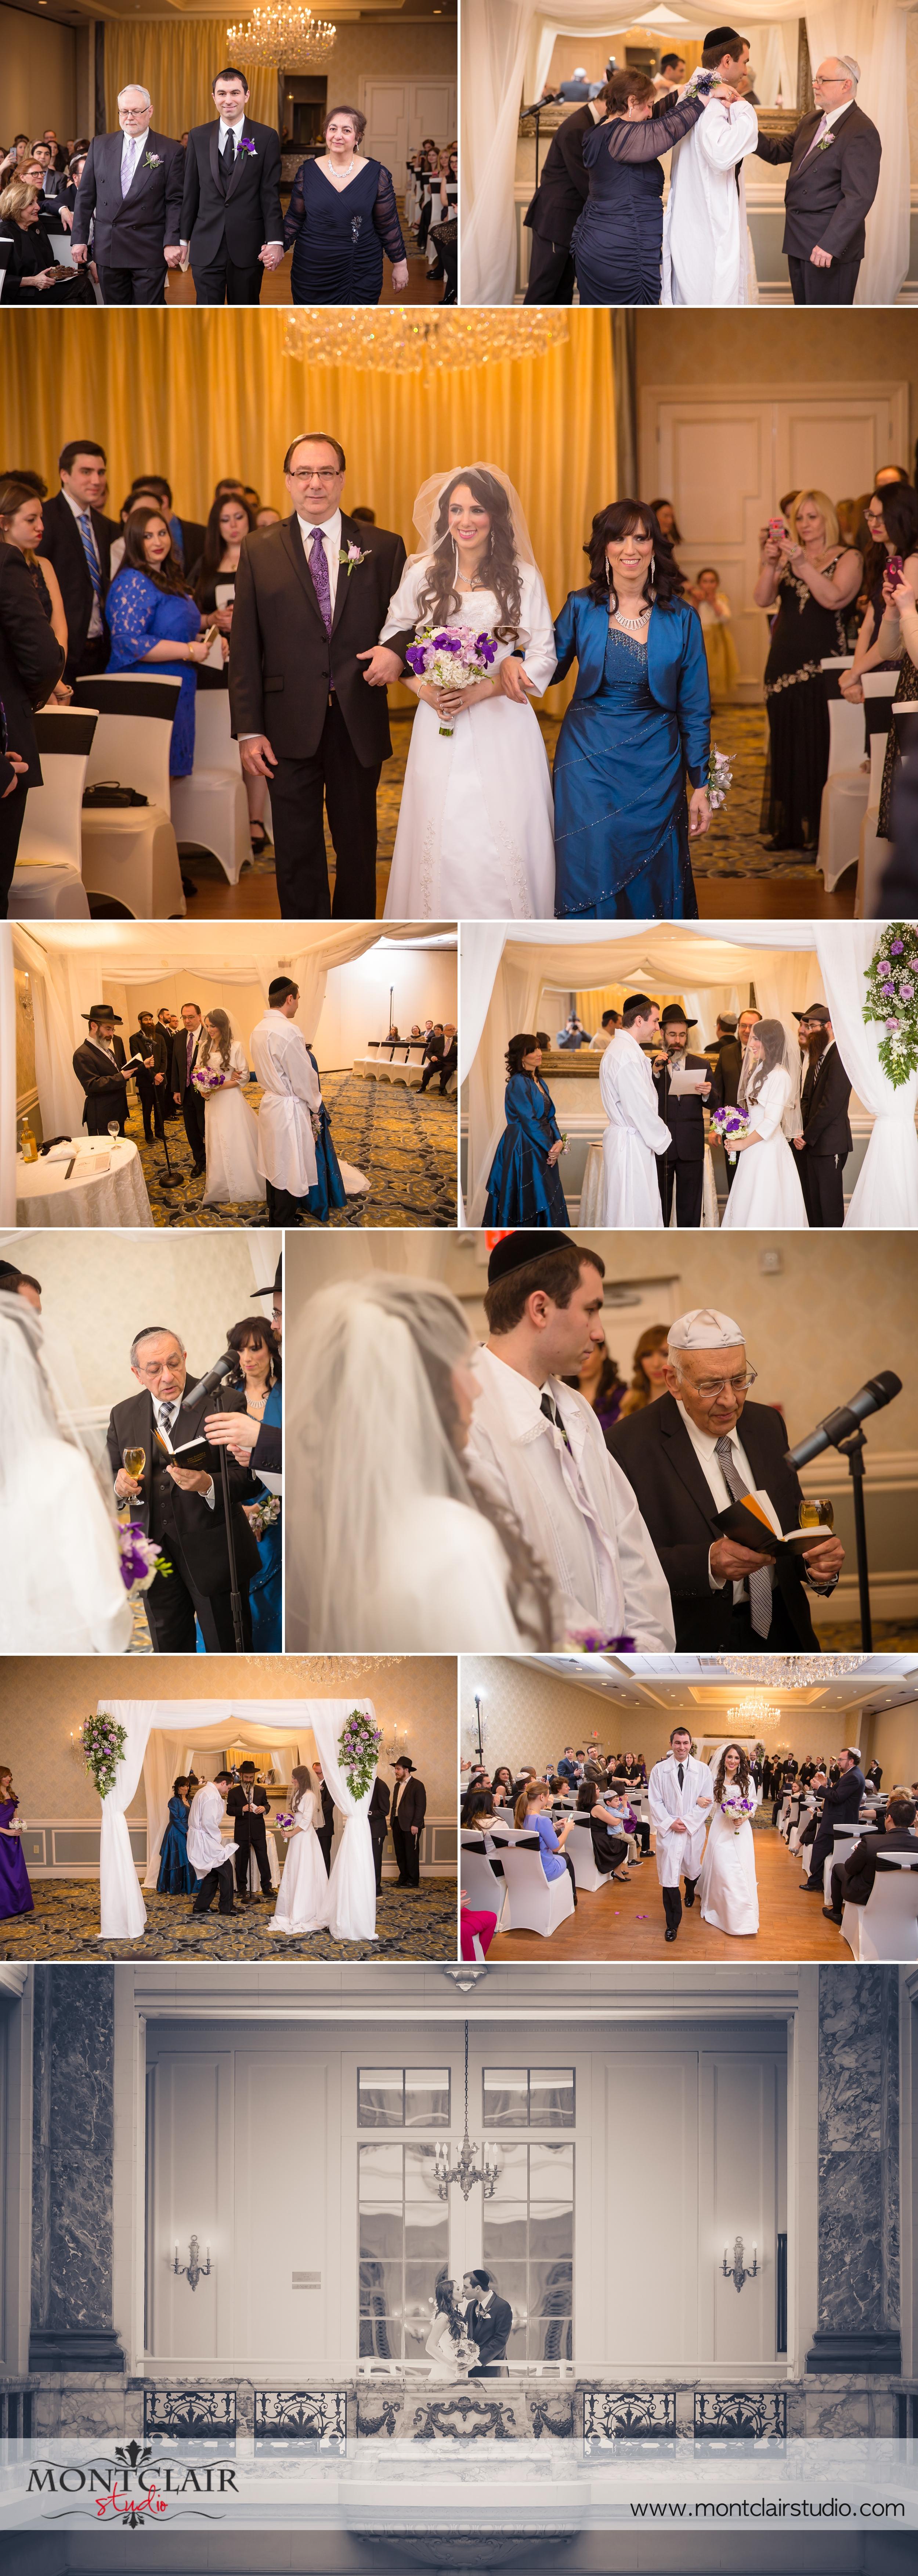 Alexa And Micheal Wedding Radisson Hotel  3.jpg